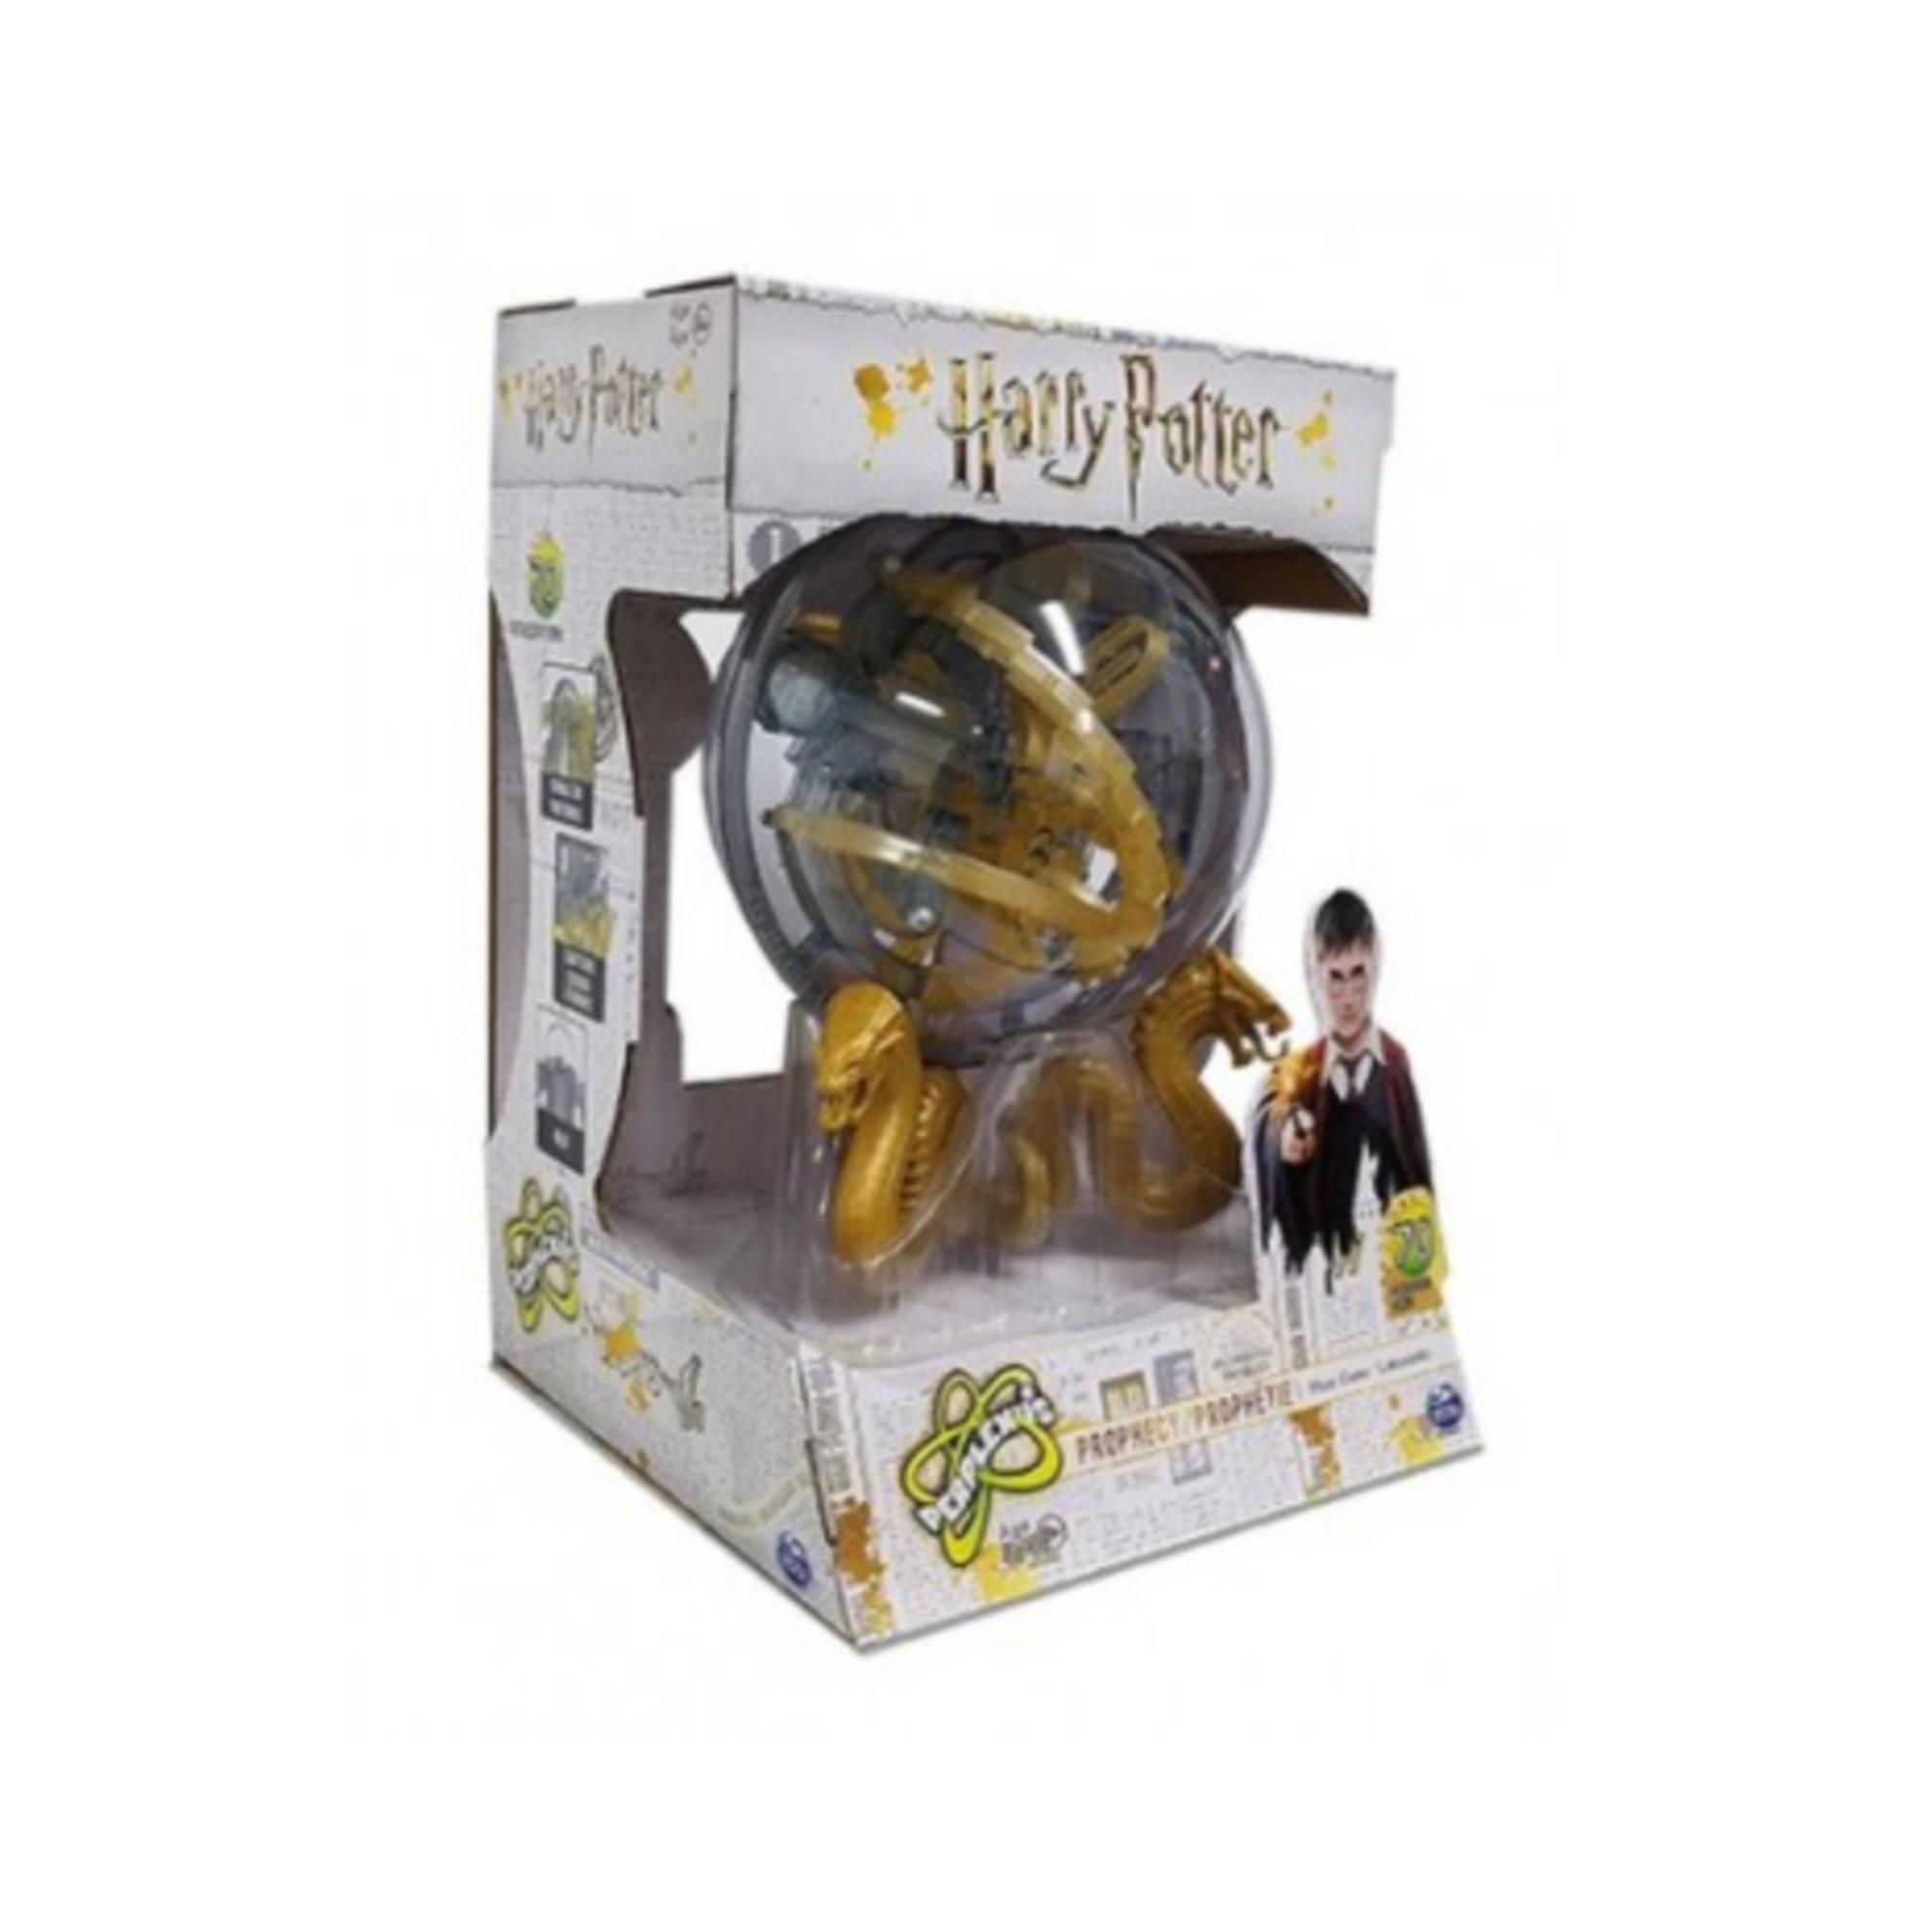 Perplexus Perplexus Harry Potter